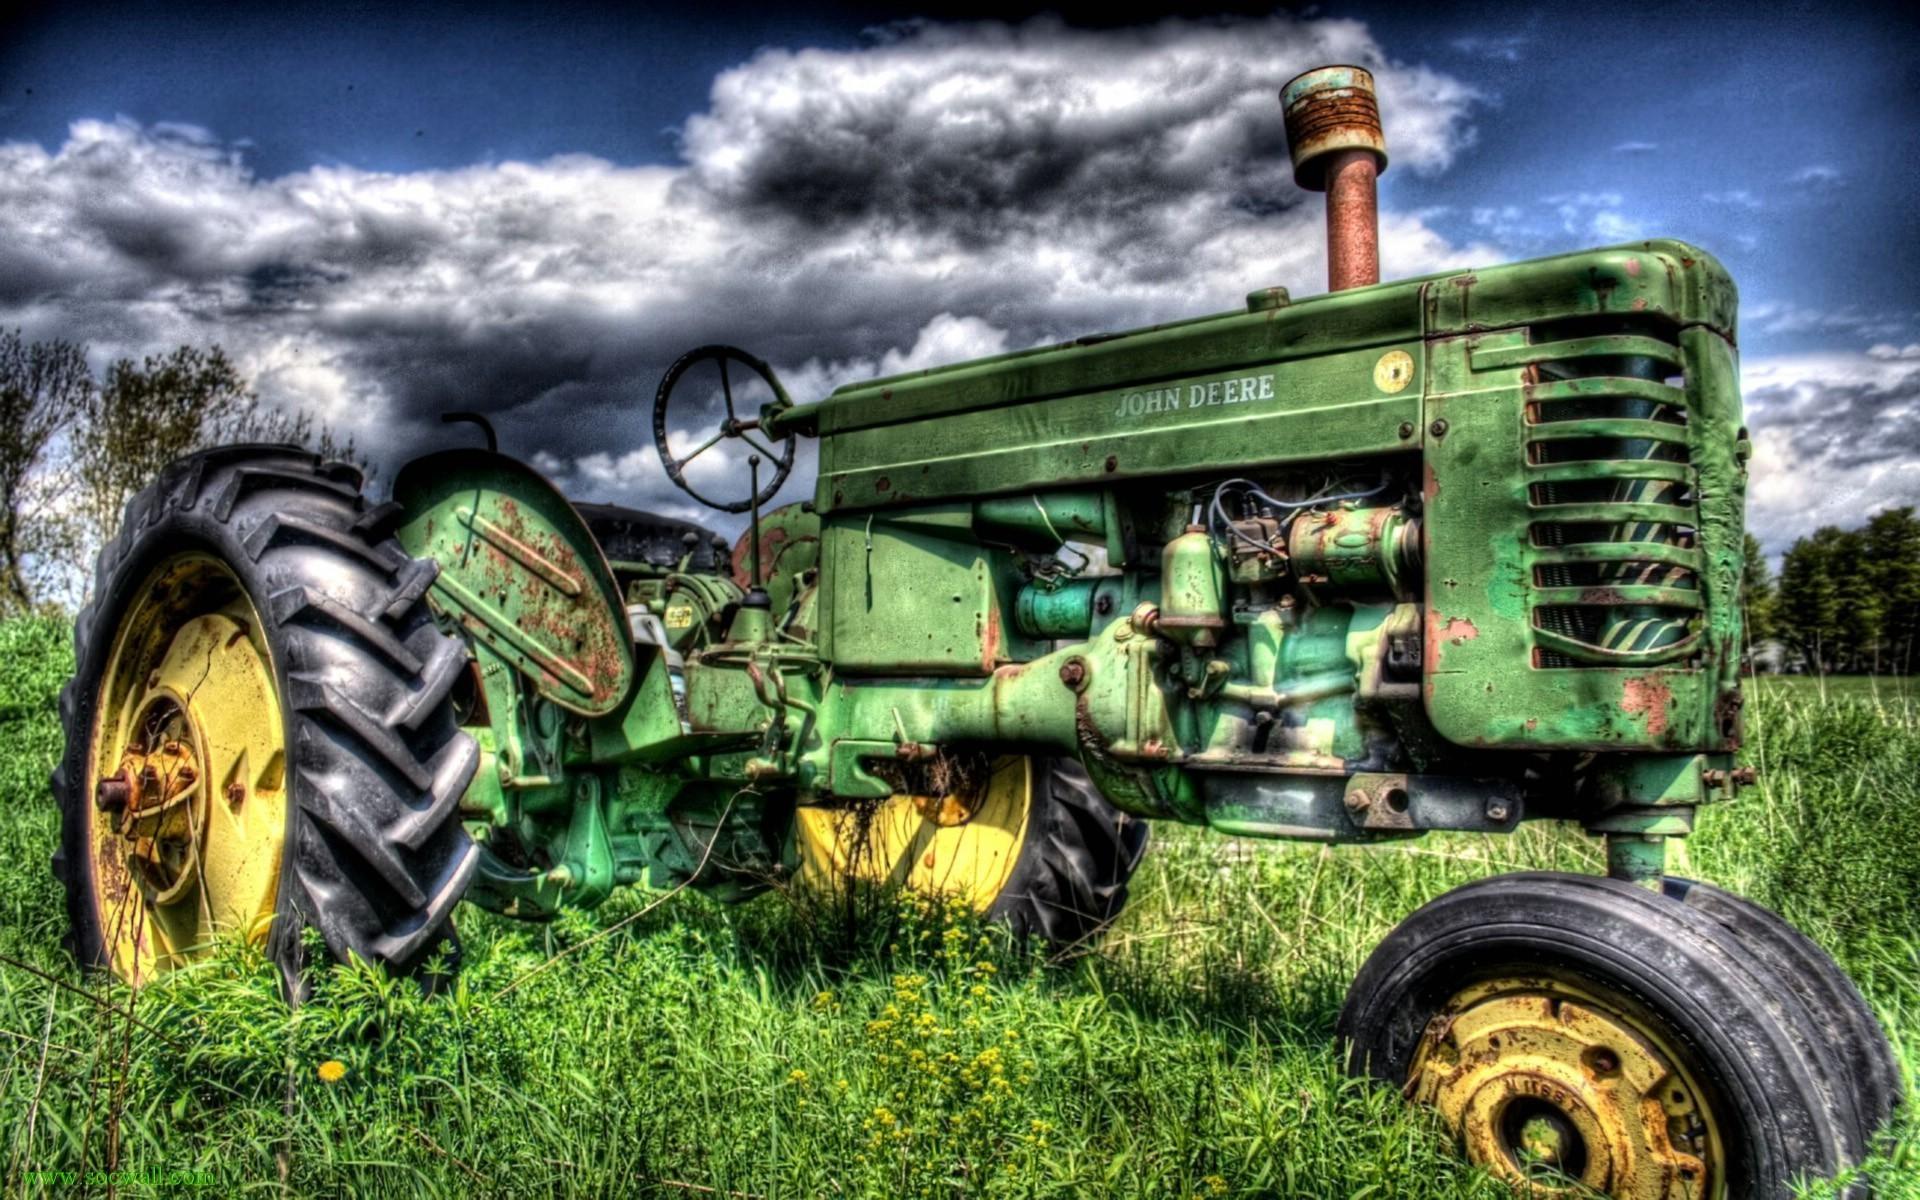 Old Farm Tractors Wallpapers httpwallippocomwallpaperold tractor 1920x1200